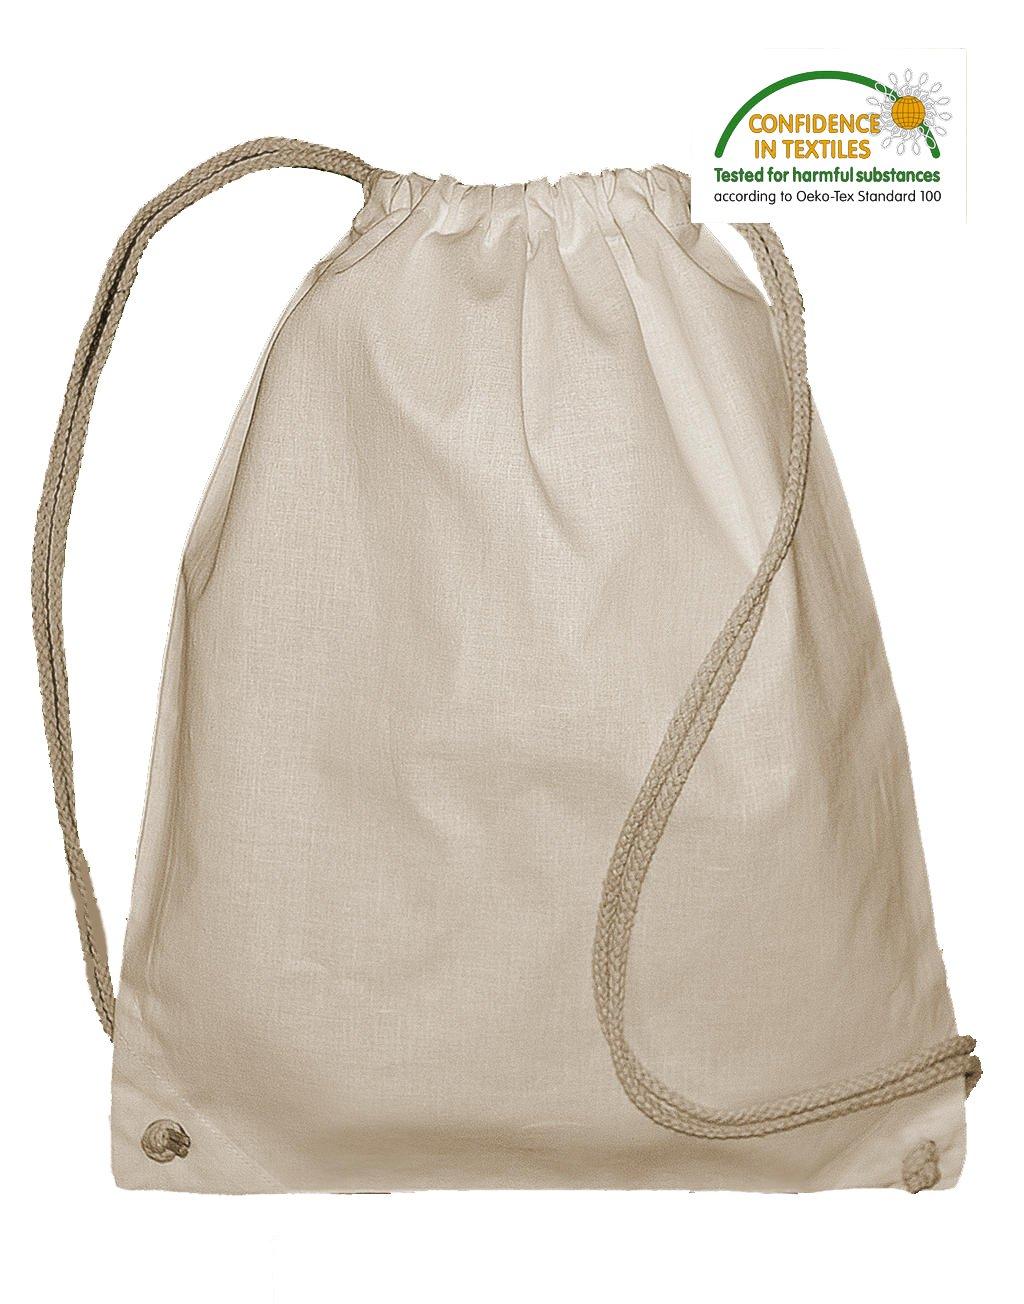 Bolsa Mochila Jassz Algodon organico Natural Grosor 140 grs. Tam ...